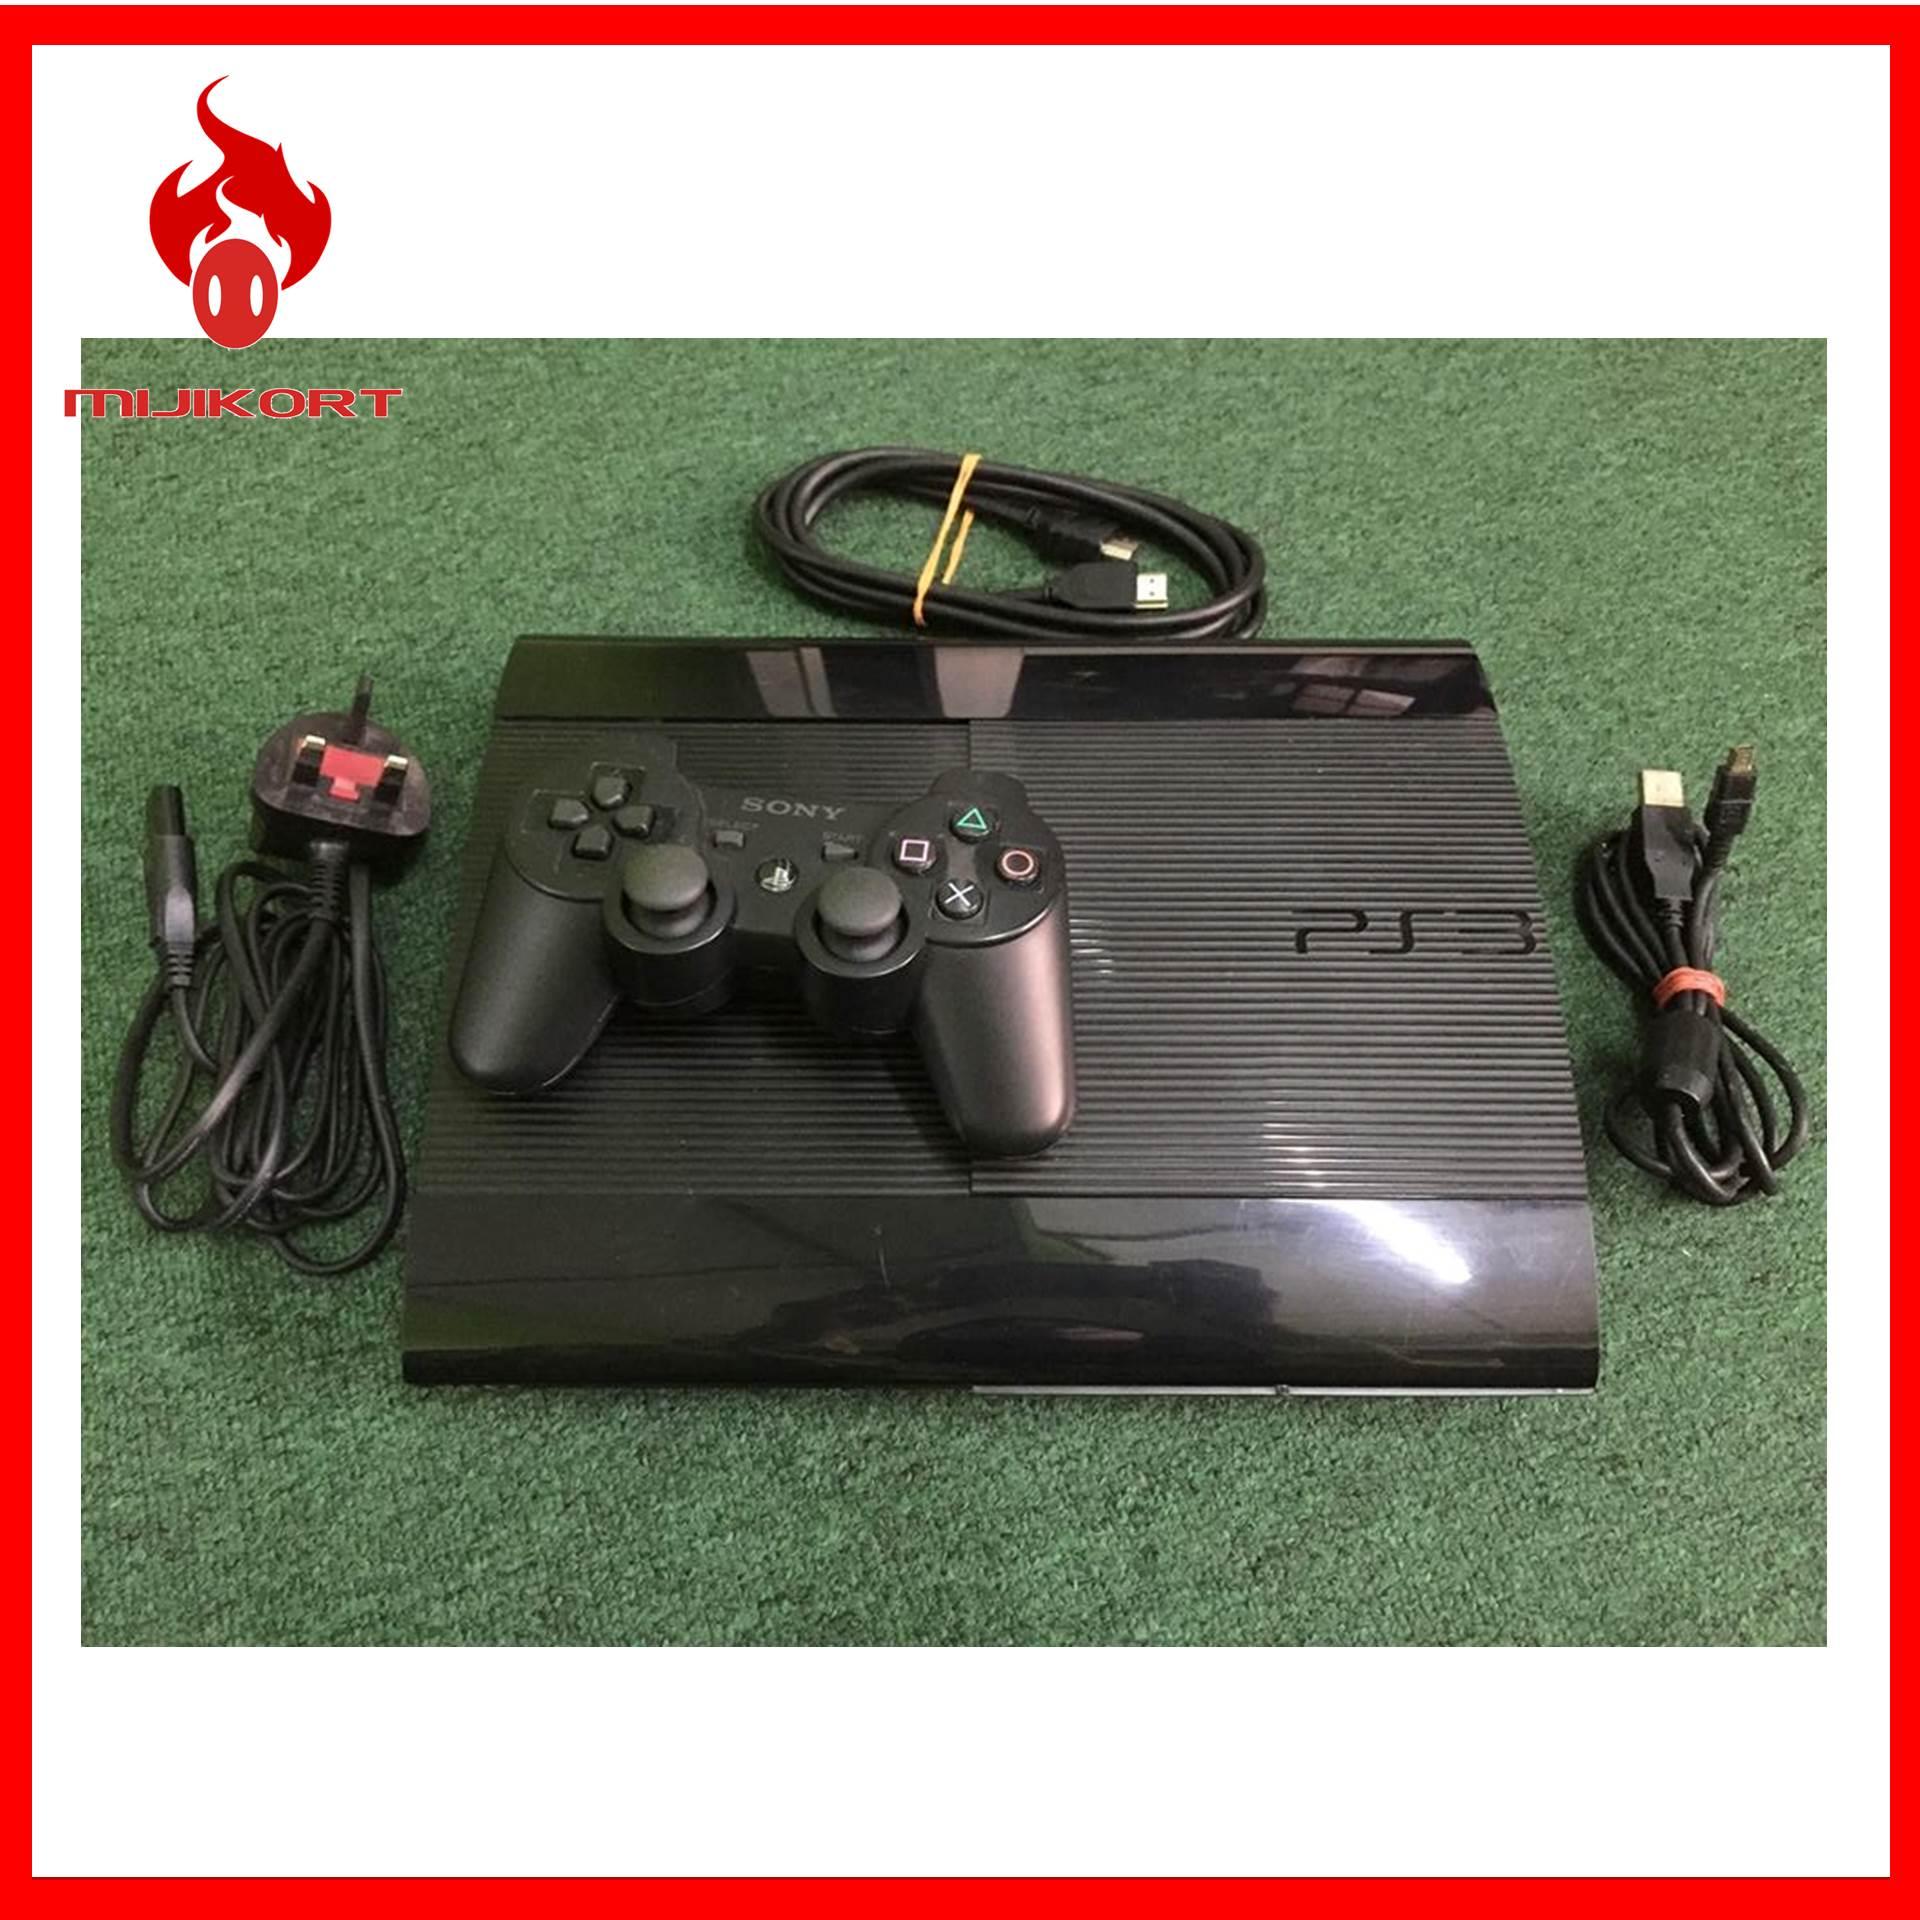 playstation 3 ps3 console super sli end 1 21 2021 12 00 am